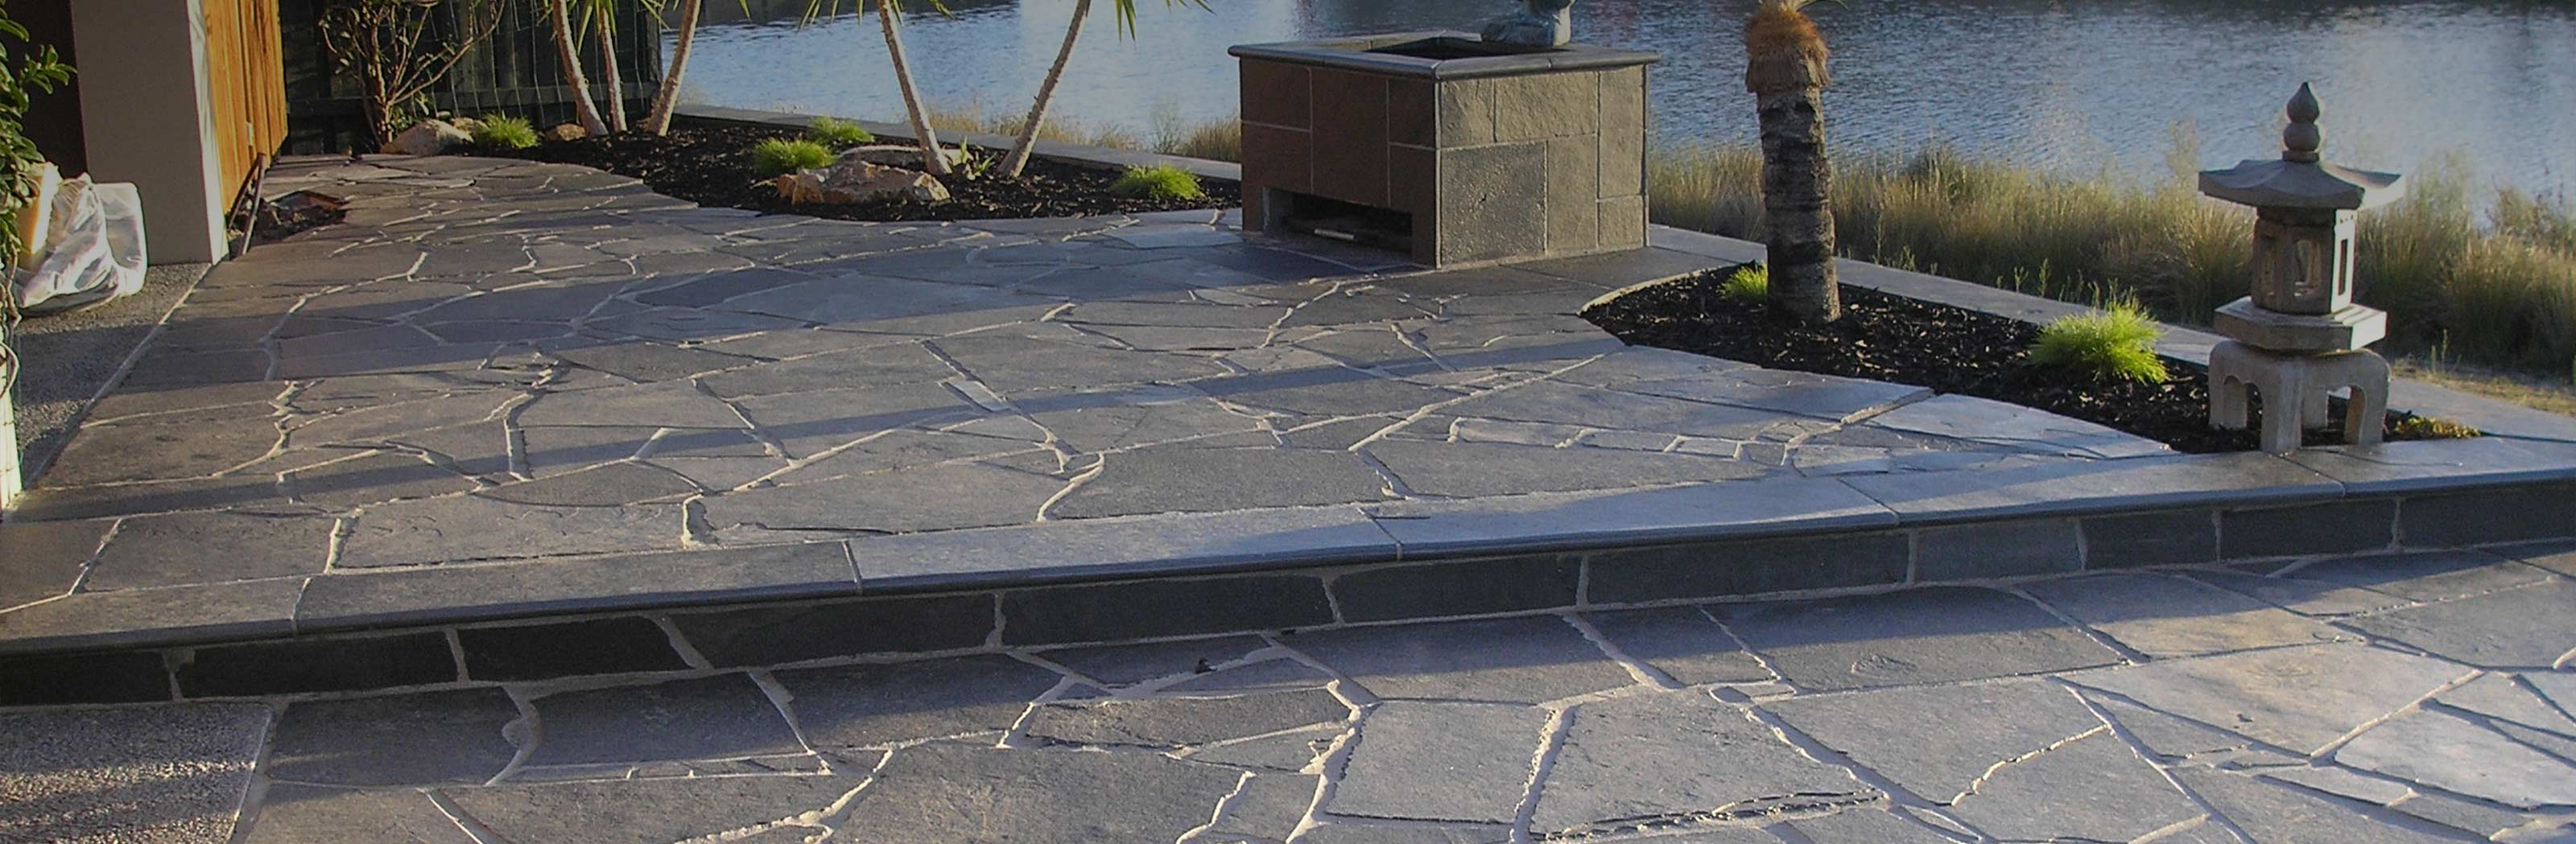 Indian Limestone - Indian Limestone Tiles